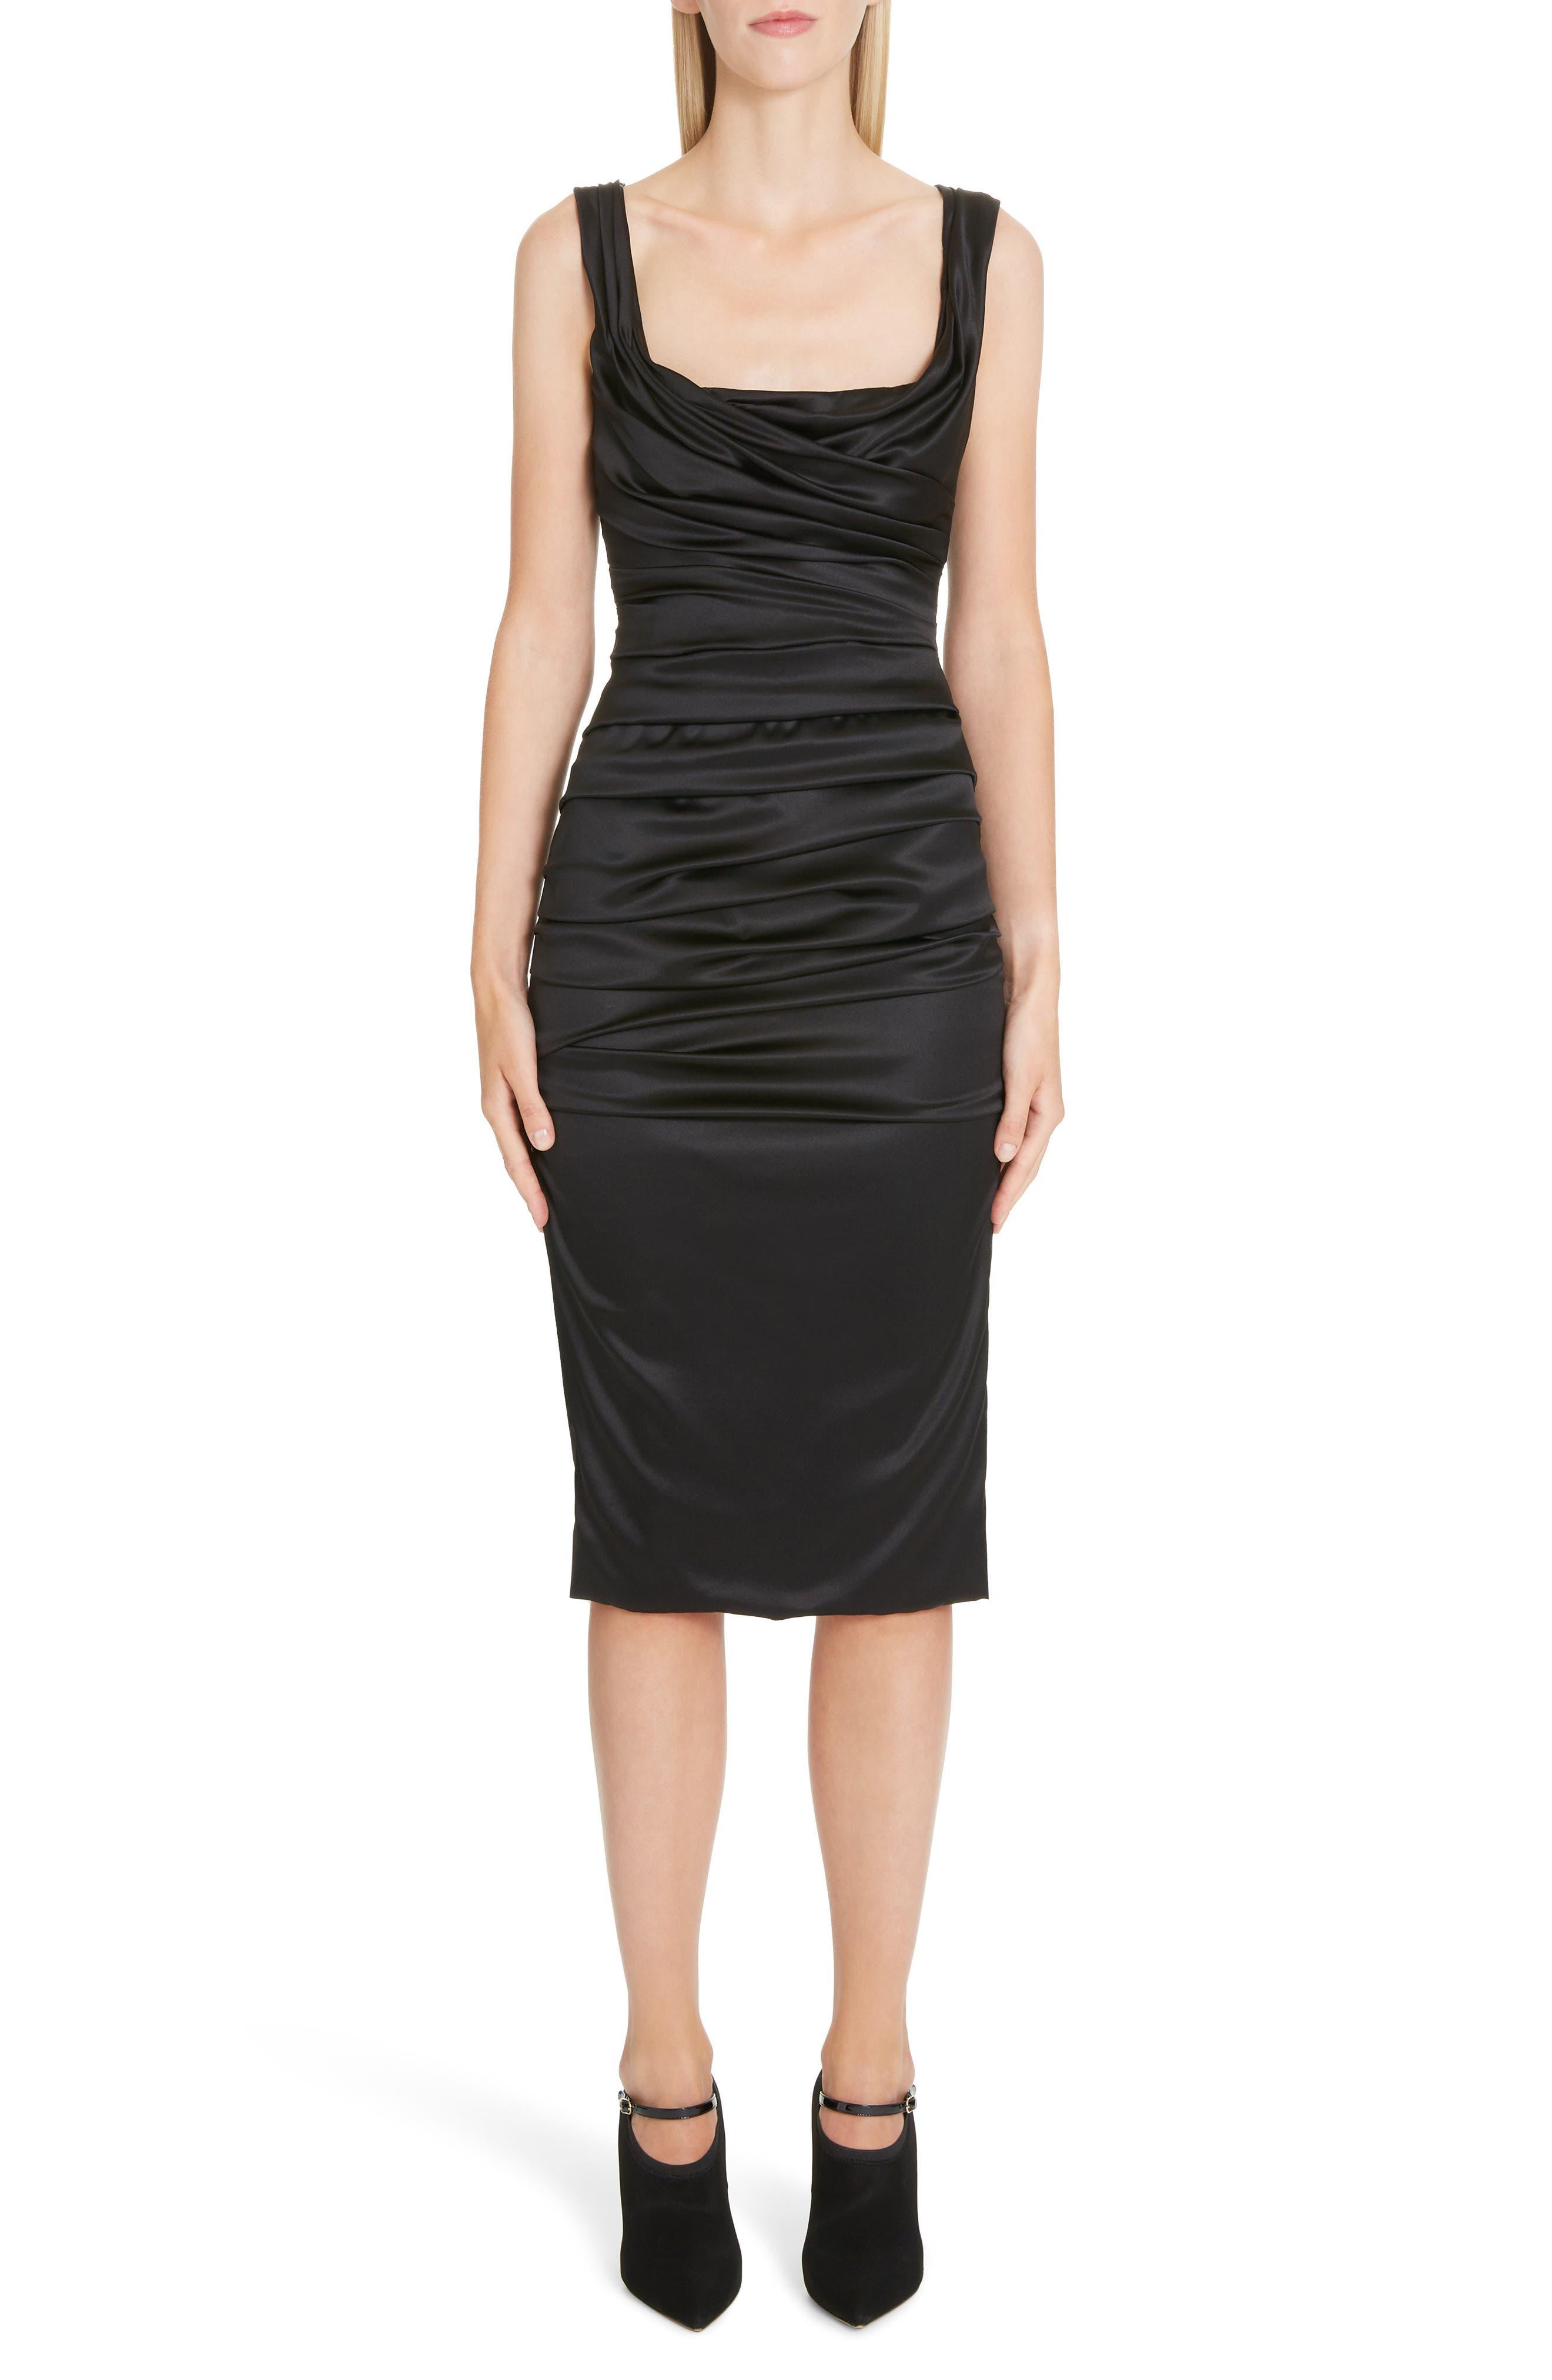 Dolce & gabbana Ruched Stretch Silk Satin Body-Con Dress, US / 48 IT - Black